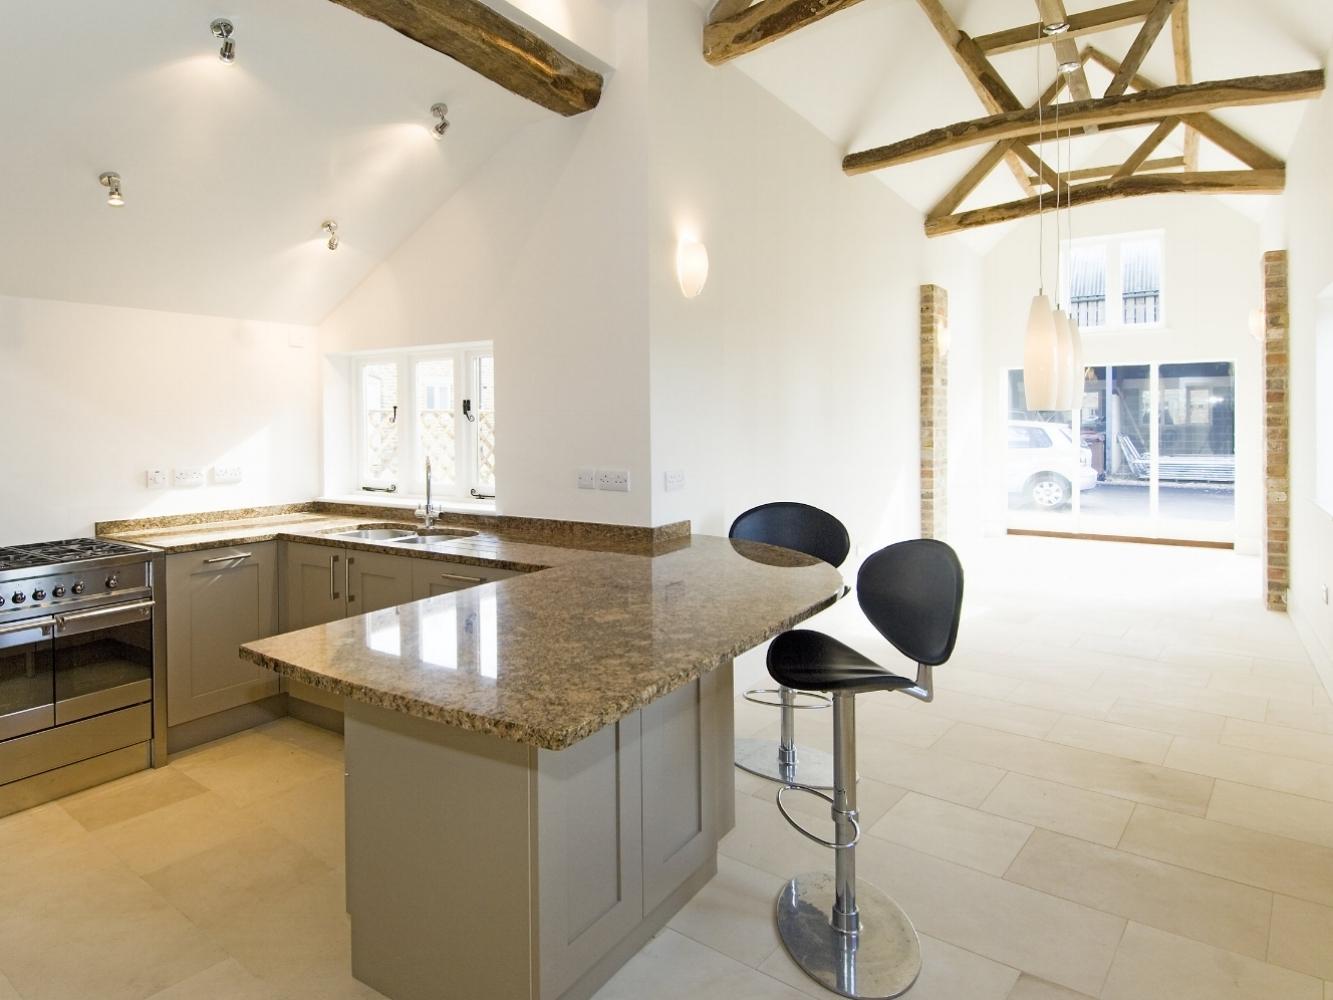 Kitchen in South Barn, barn conversion, Tredington, Gloucestershire